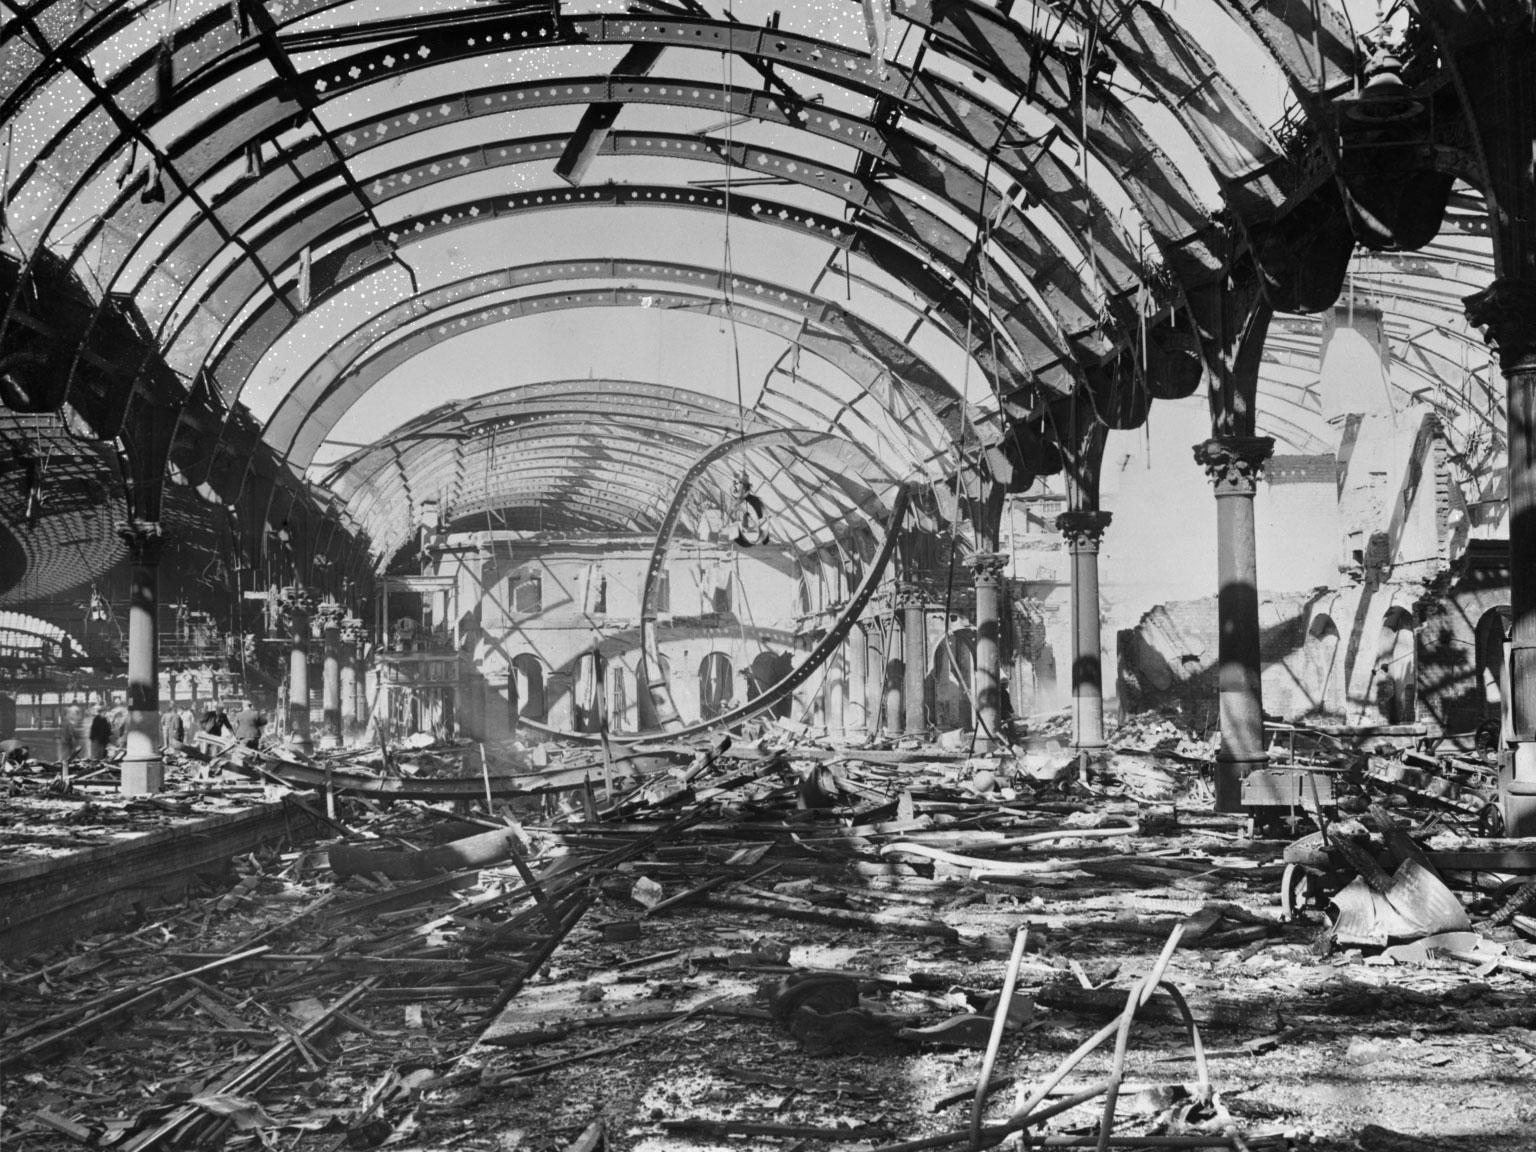 yr6 air-raid-damage-to-platforms-2-and-3-york-station-29th-april-1942.jpg